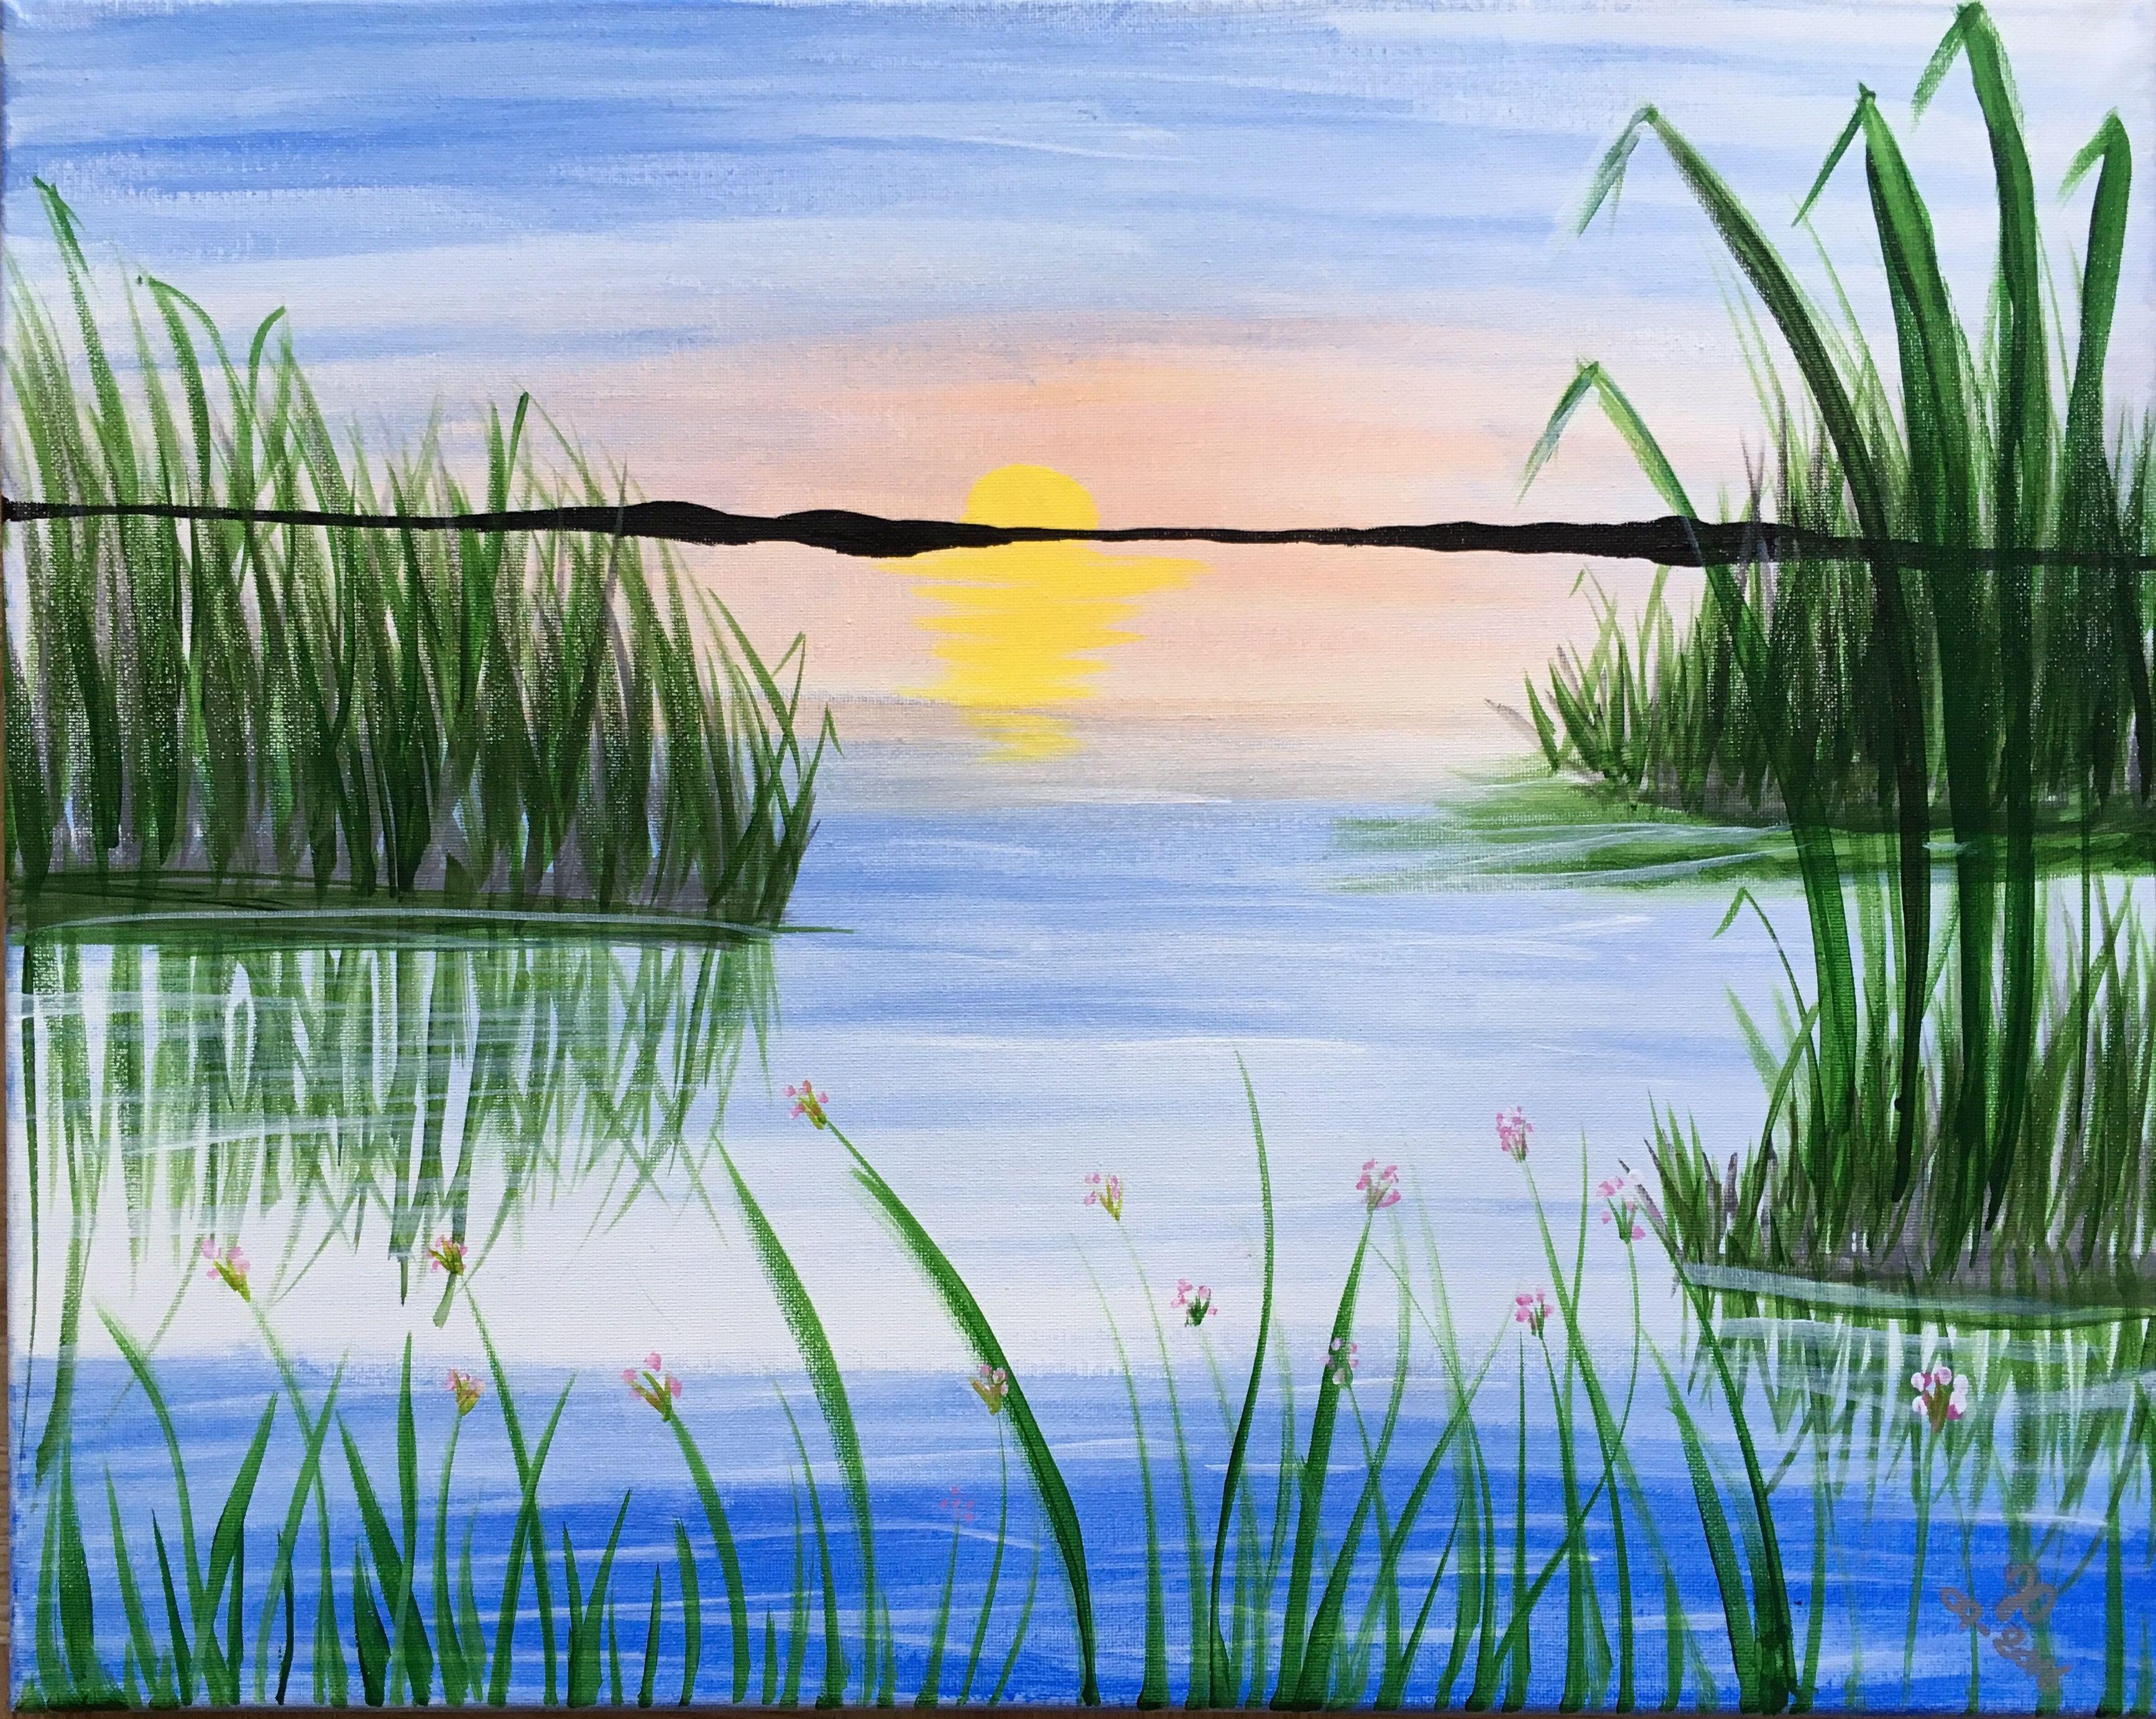 Paint Nite Lake Painting Lake Sunset Painting Sunset Painting